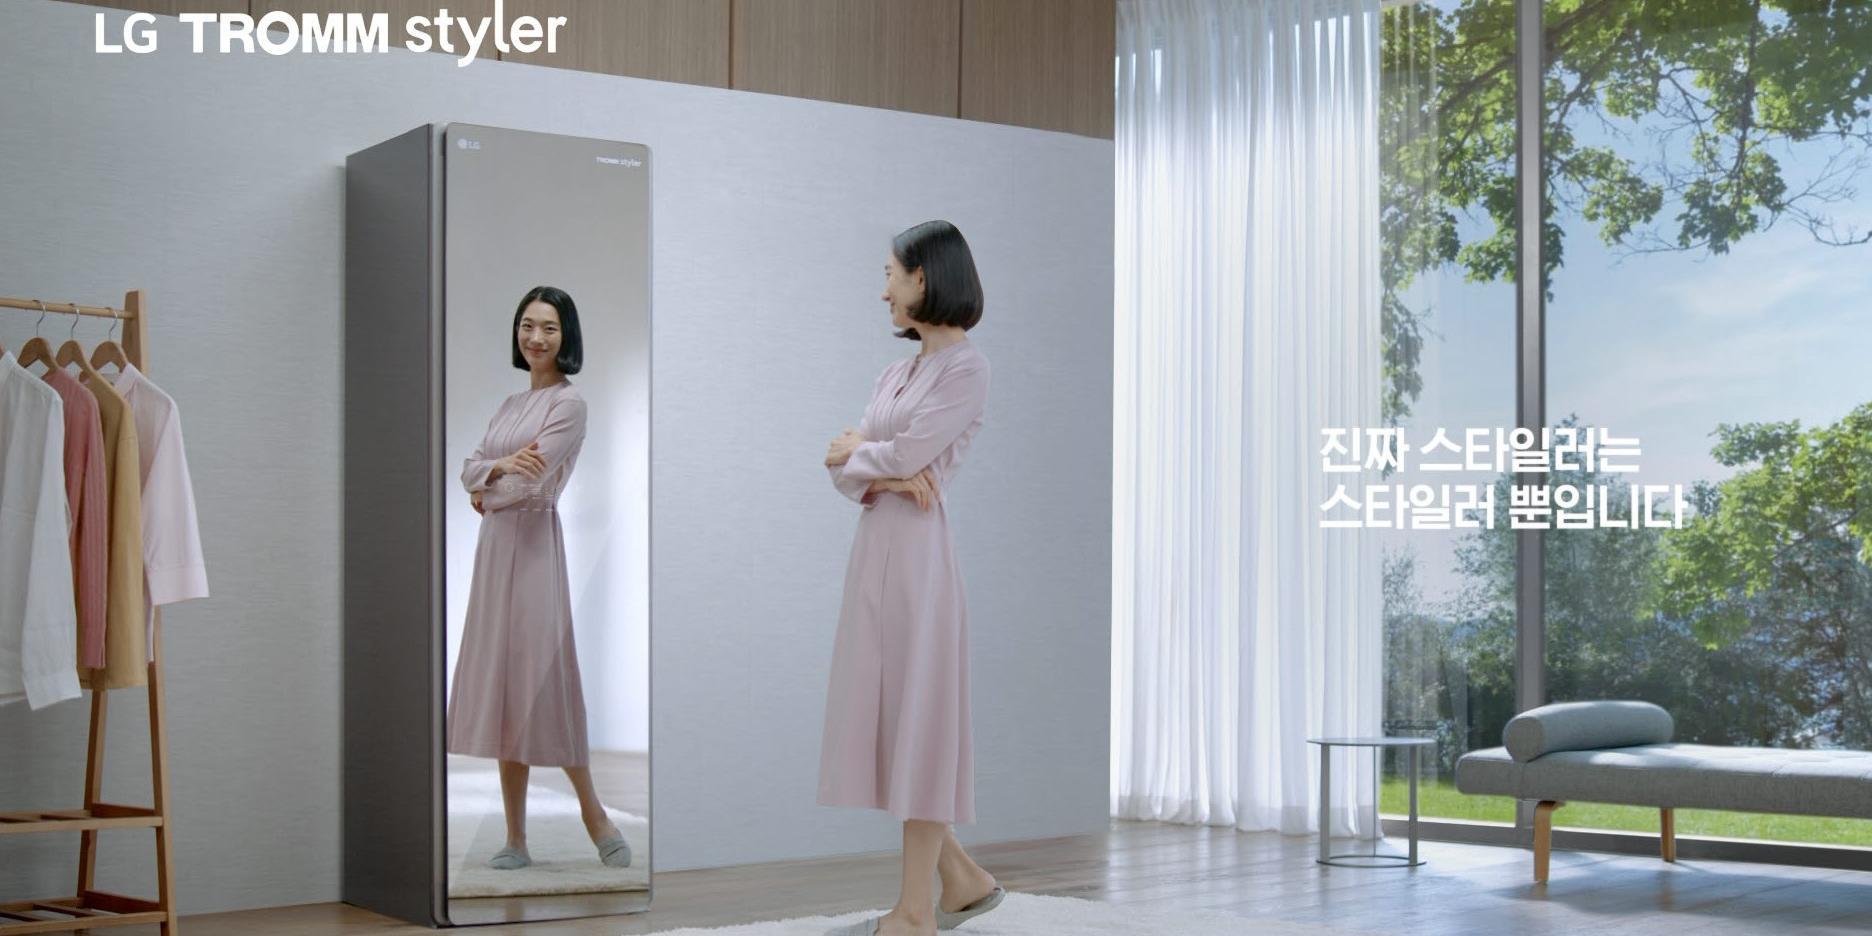 LG전자, 트롬 스타일러 차별적 편리함 강조한 새 TV광고 시작